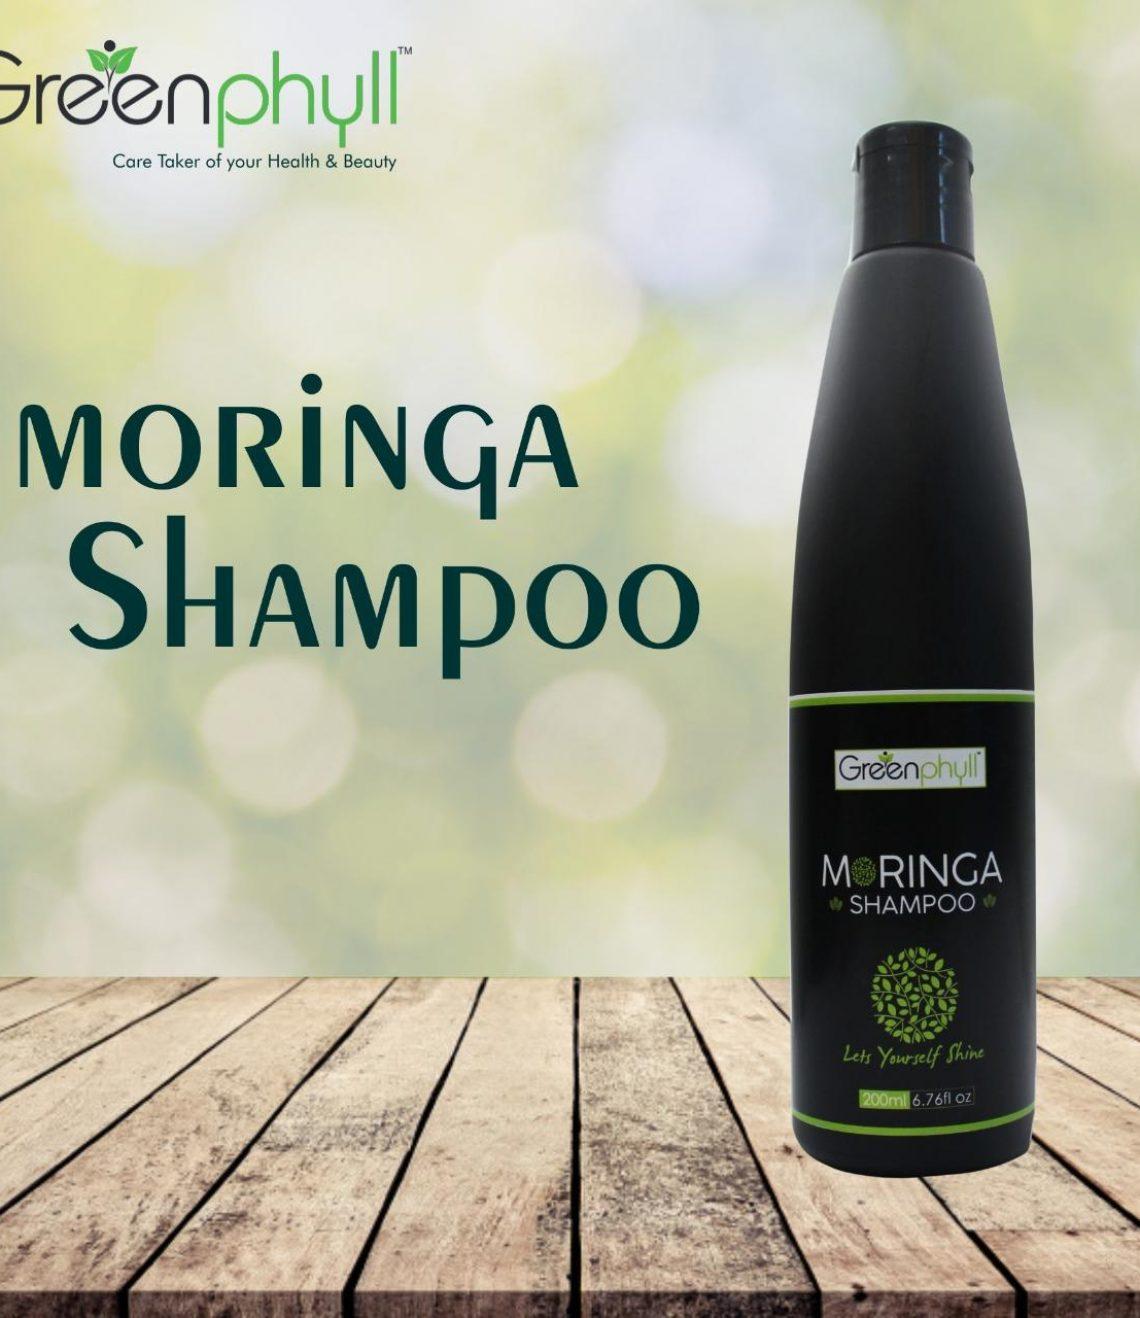 Greenphyll shampoo